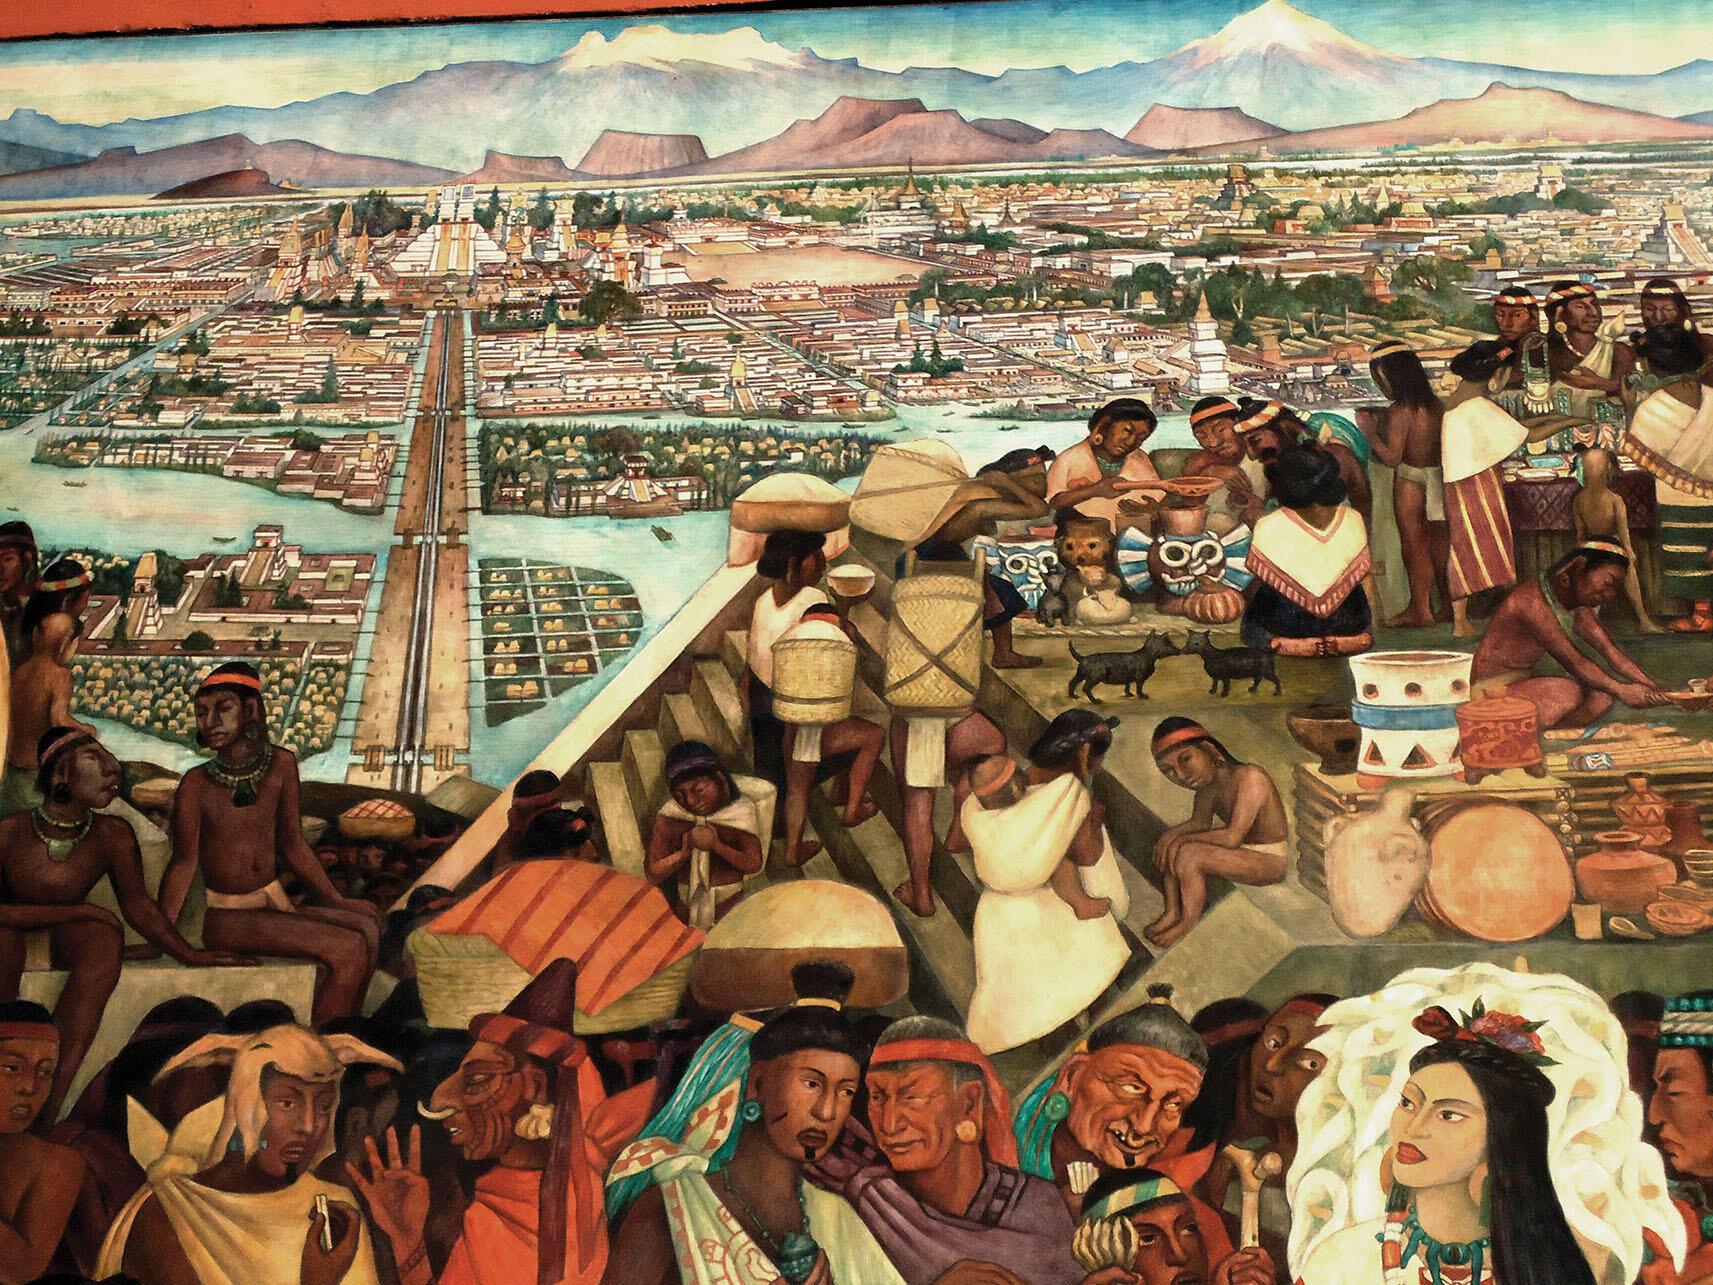 A photo showing detail of Diego Rivera's mural of Aztec city life at Mexico's Palacio Nacional. (Photo by kgv88/Wikimedia.)